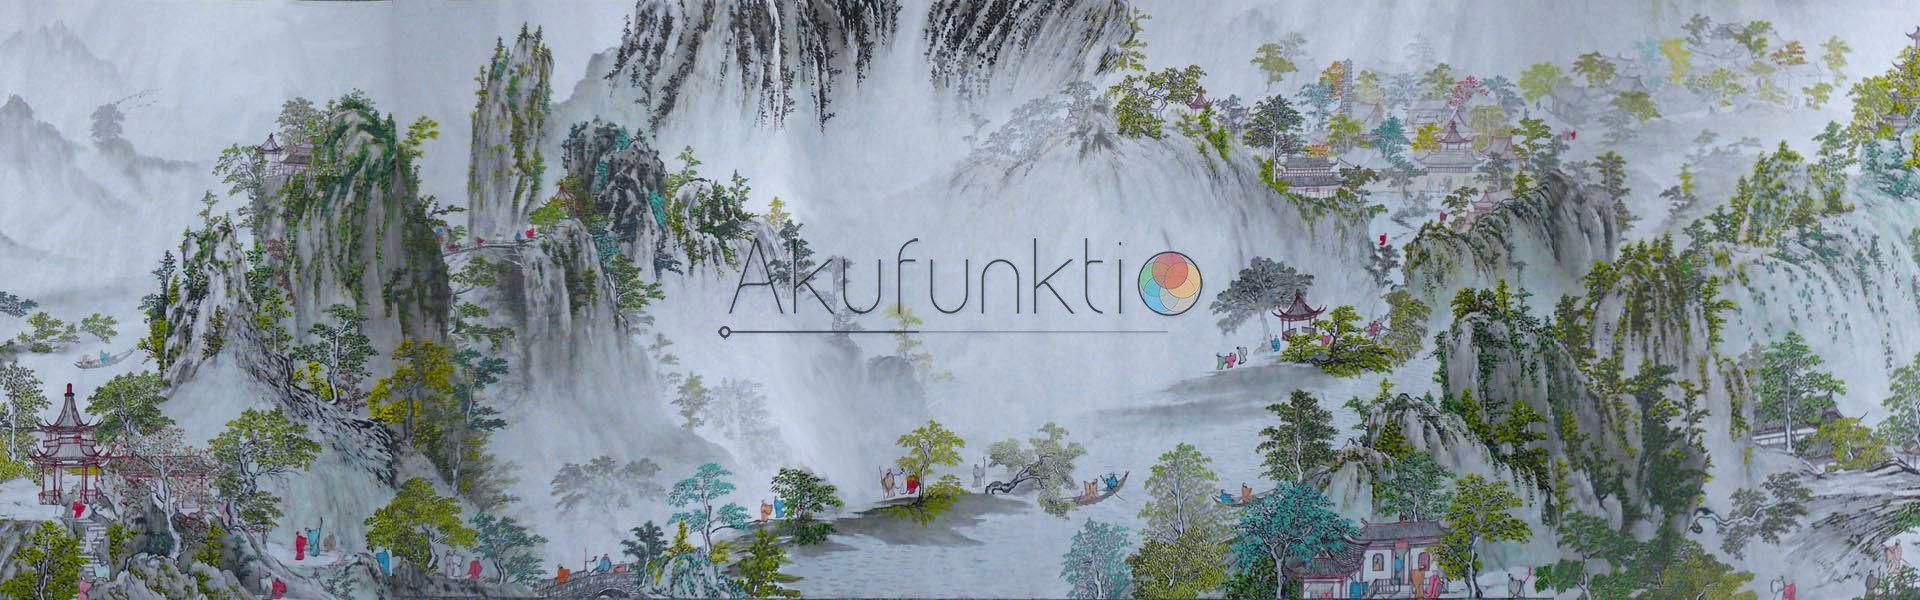 Akupunktio Helsinki • Akufunktio